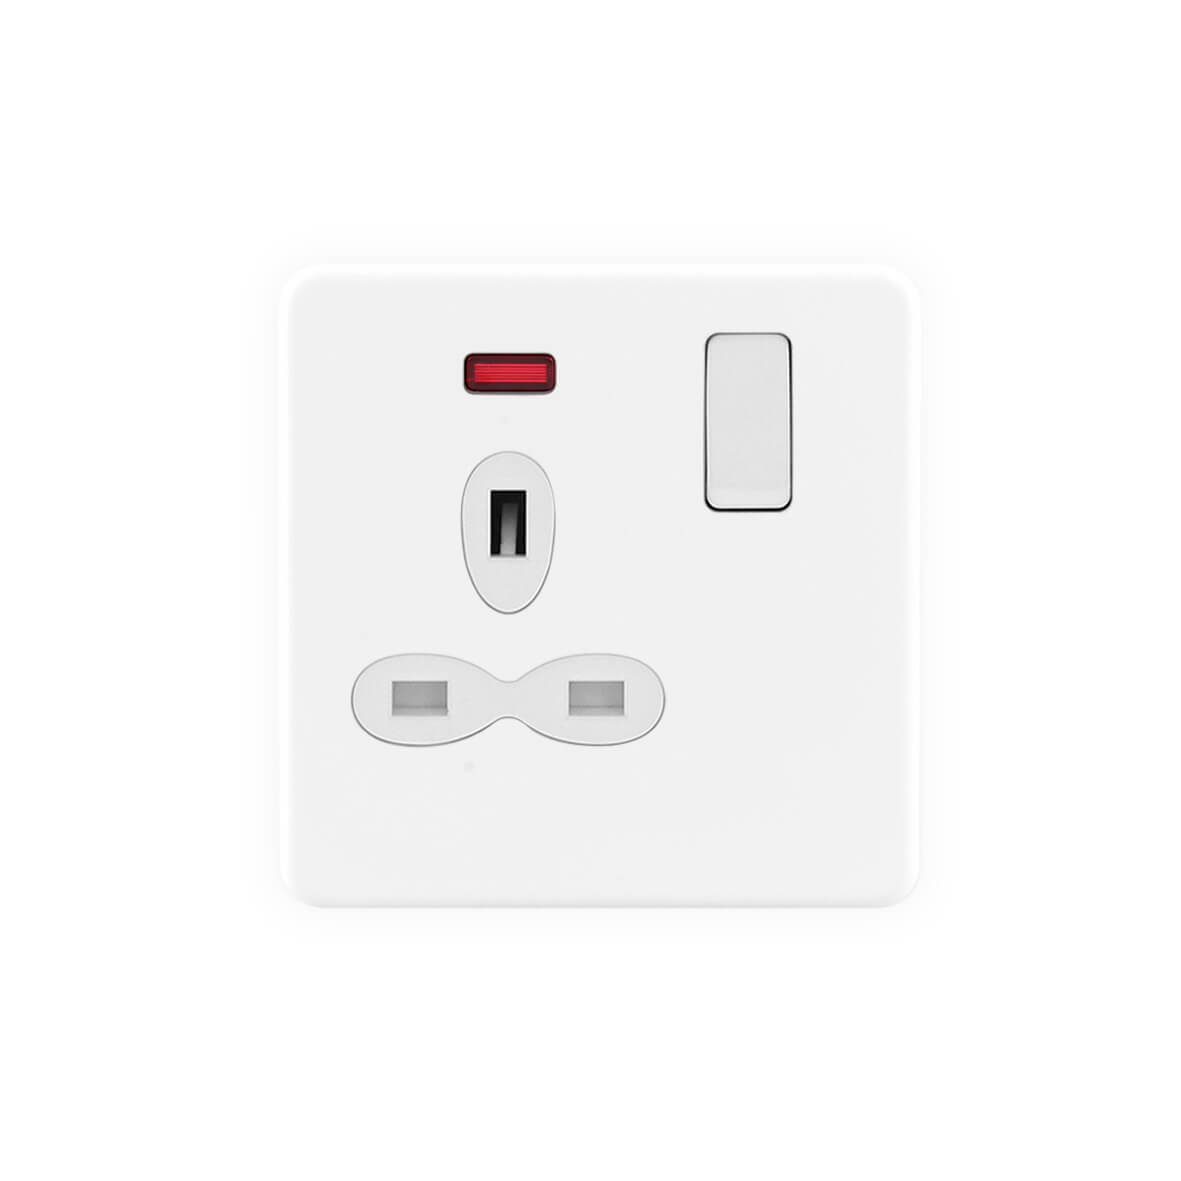 Matt white Screwless 45A 2G Gang DP cooker switch with neon indicator